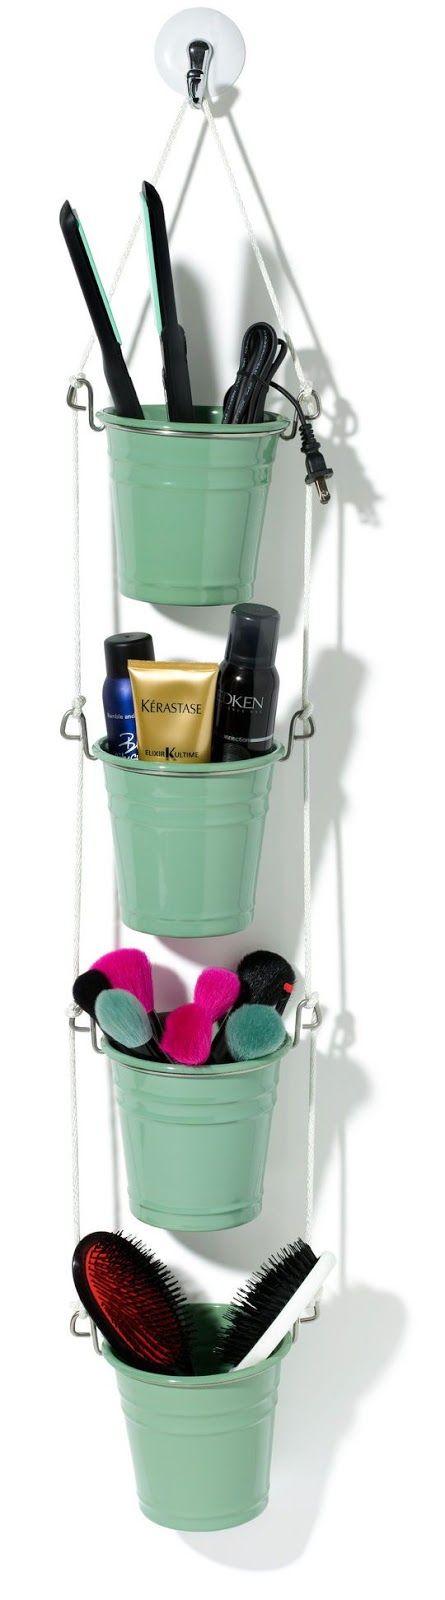 Organizador de baño DIY